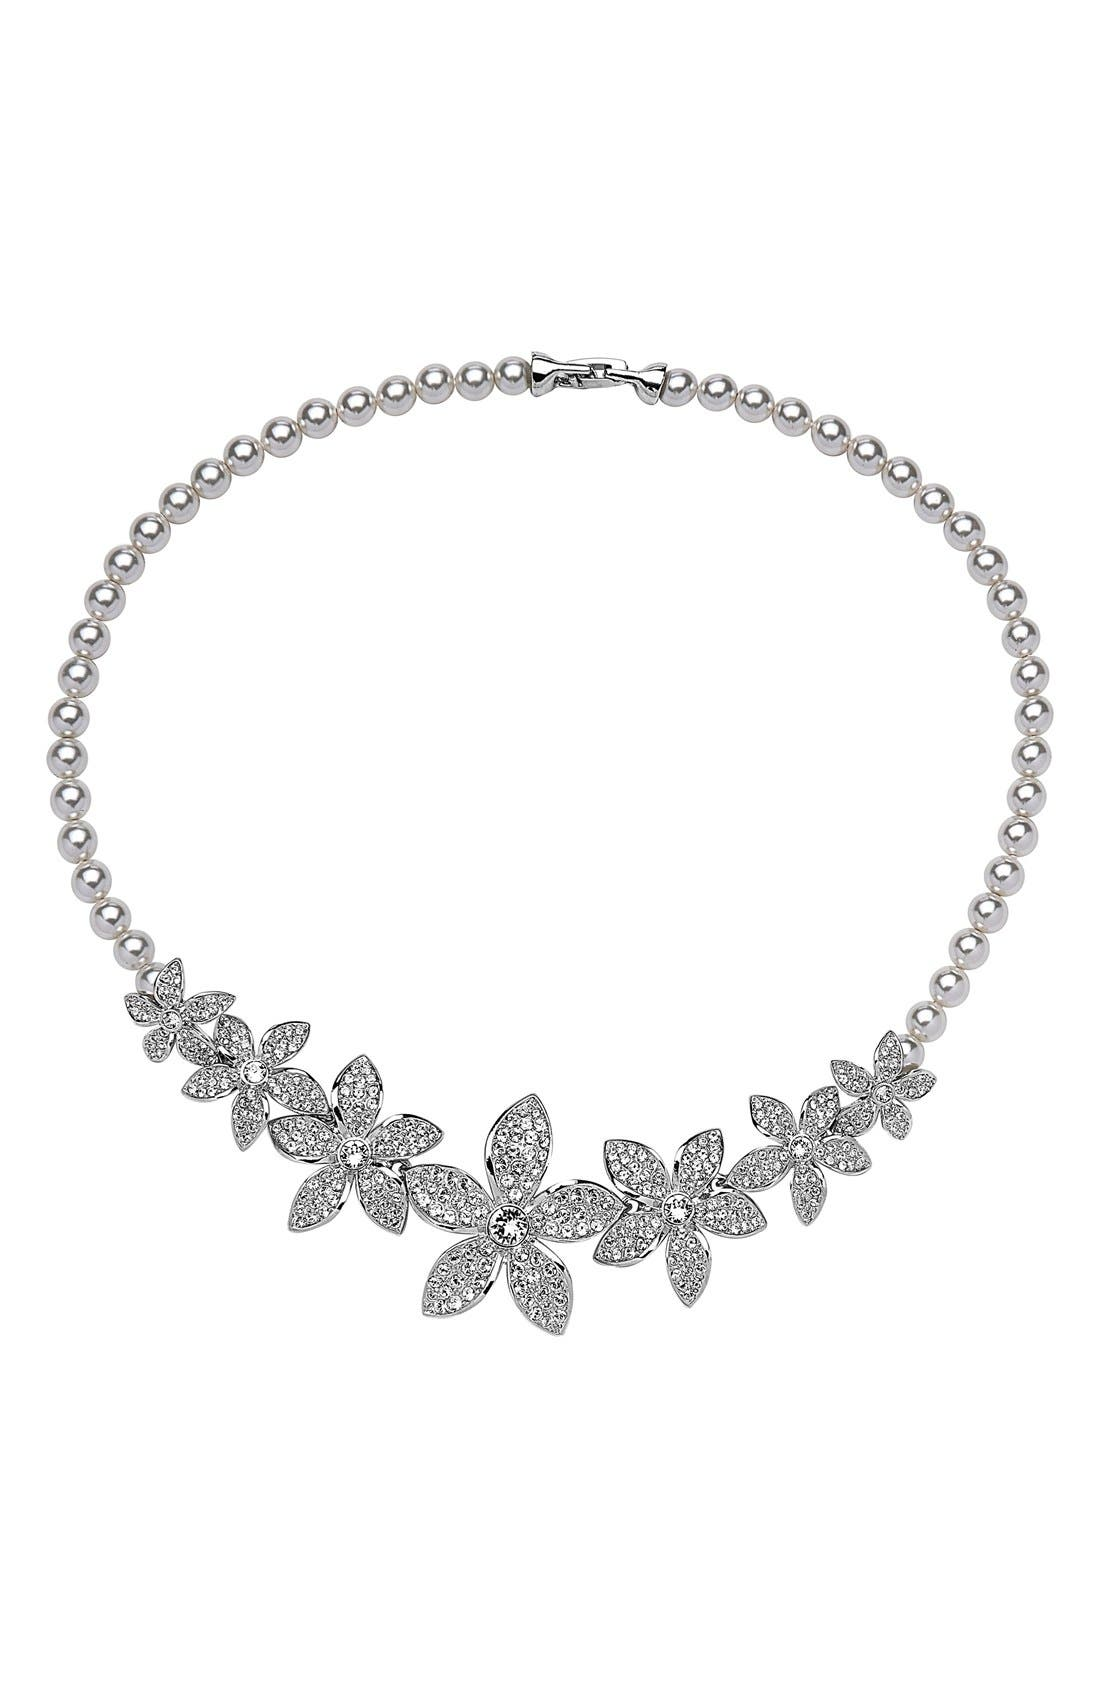 Main Image - Nina Crystal & Faux Pearl Frontal Necklace